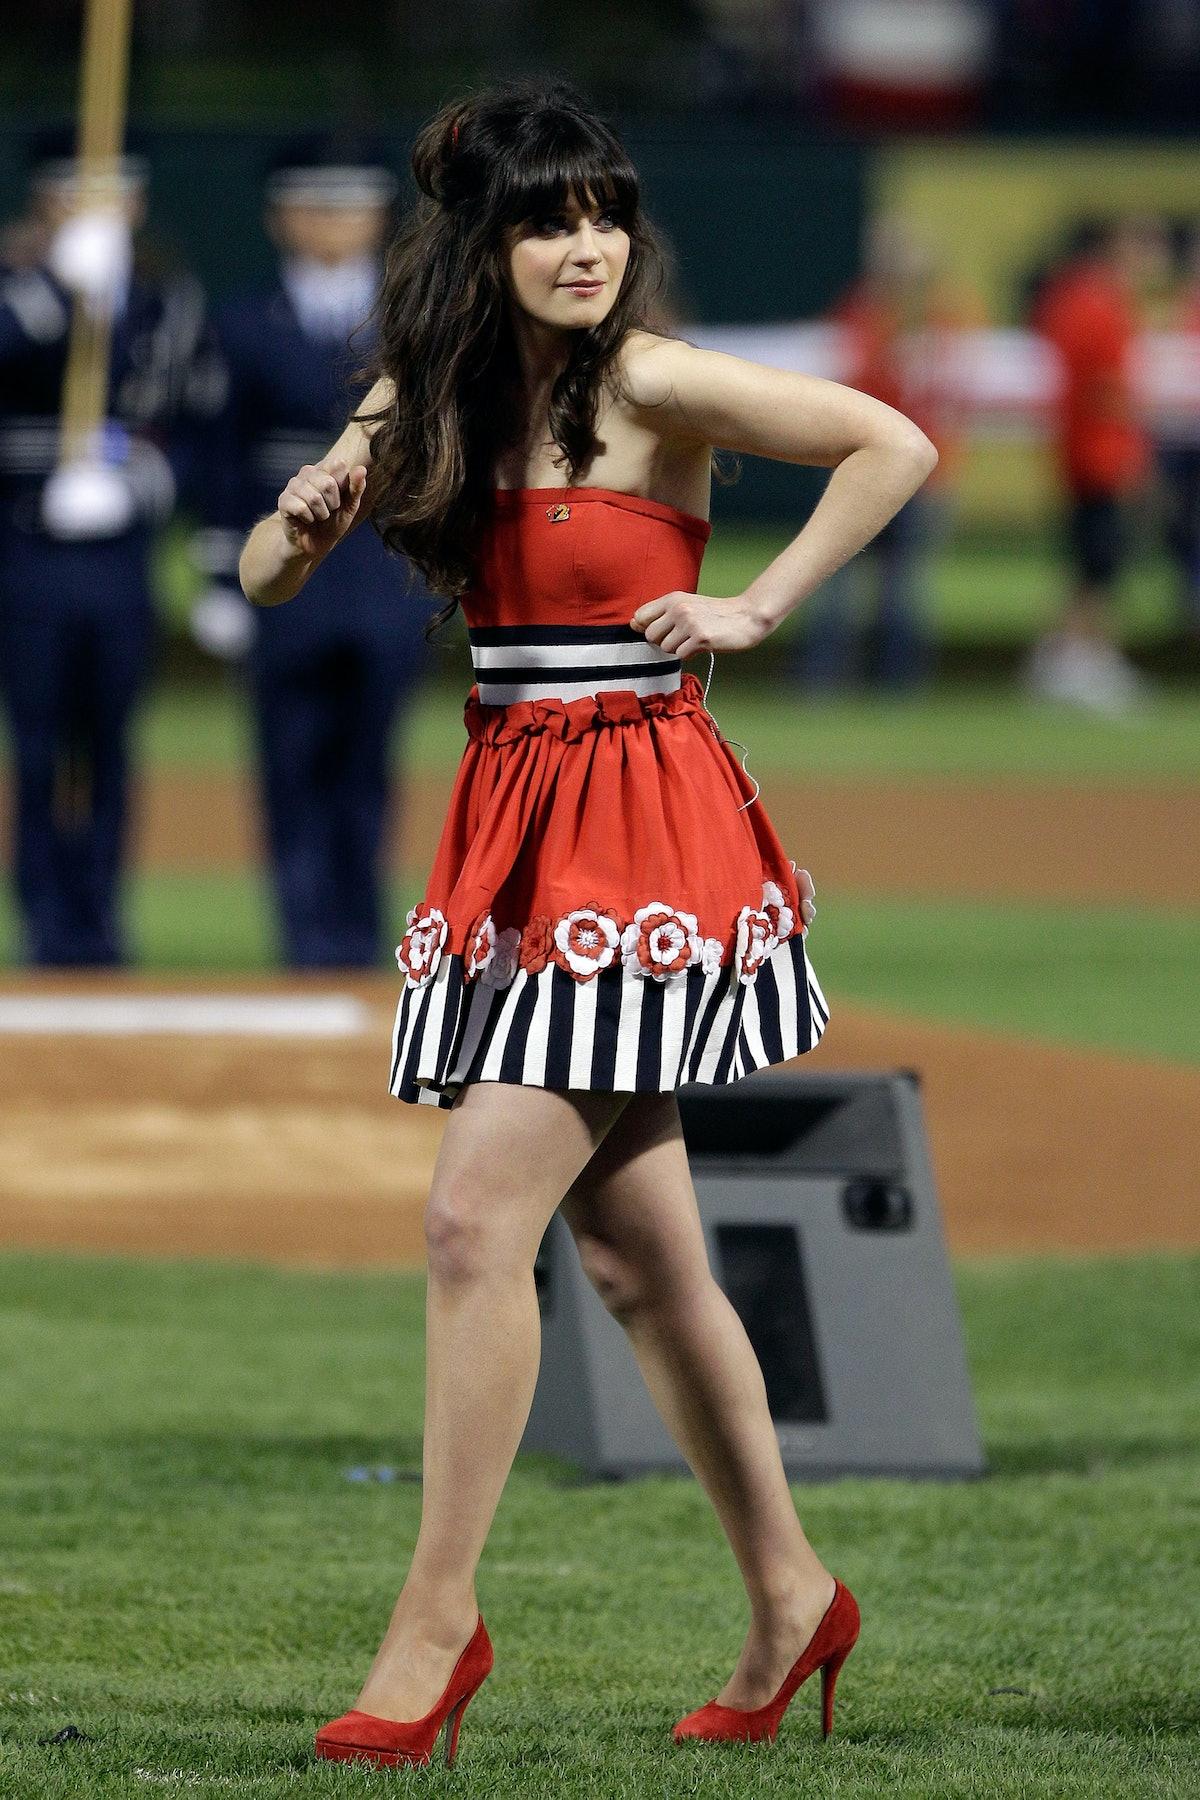 2011 World Series Game 4 - Texas Rangers v St Louis Cardinals